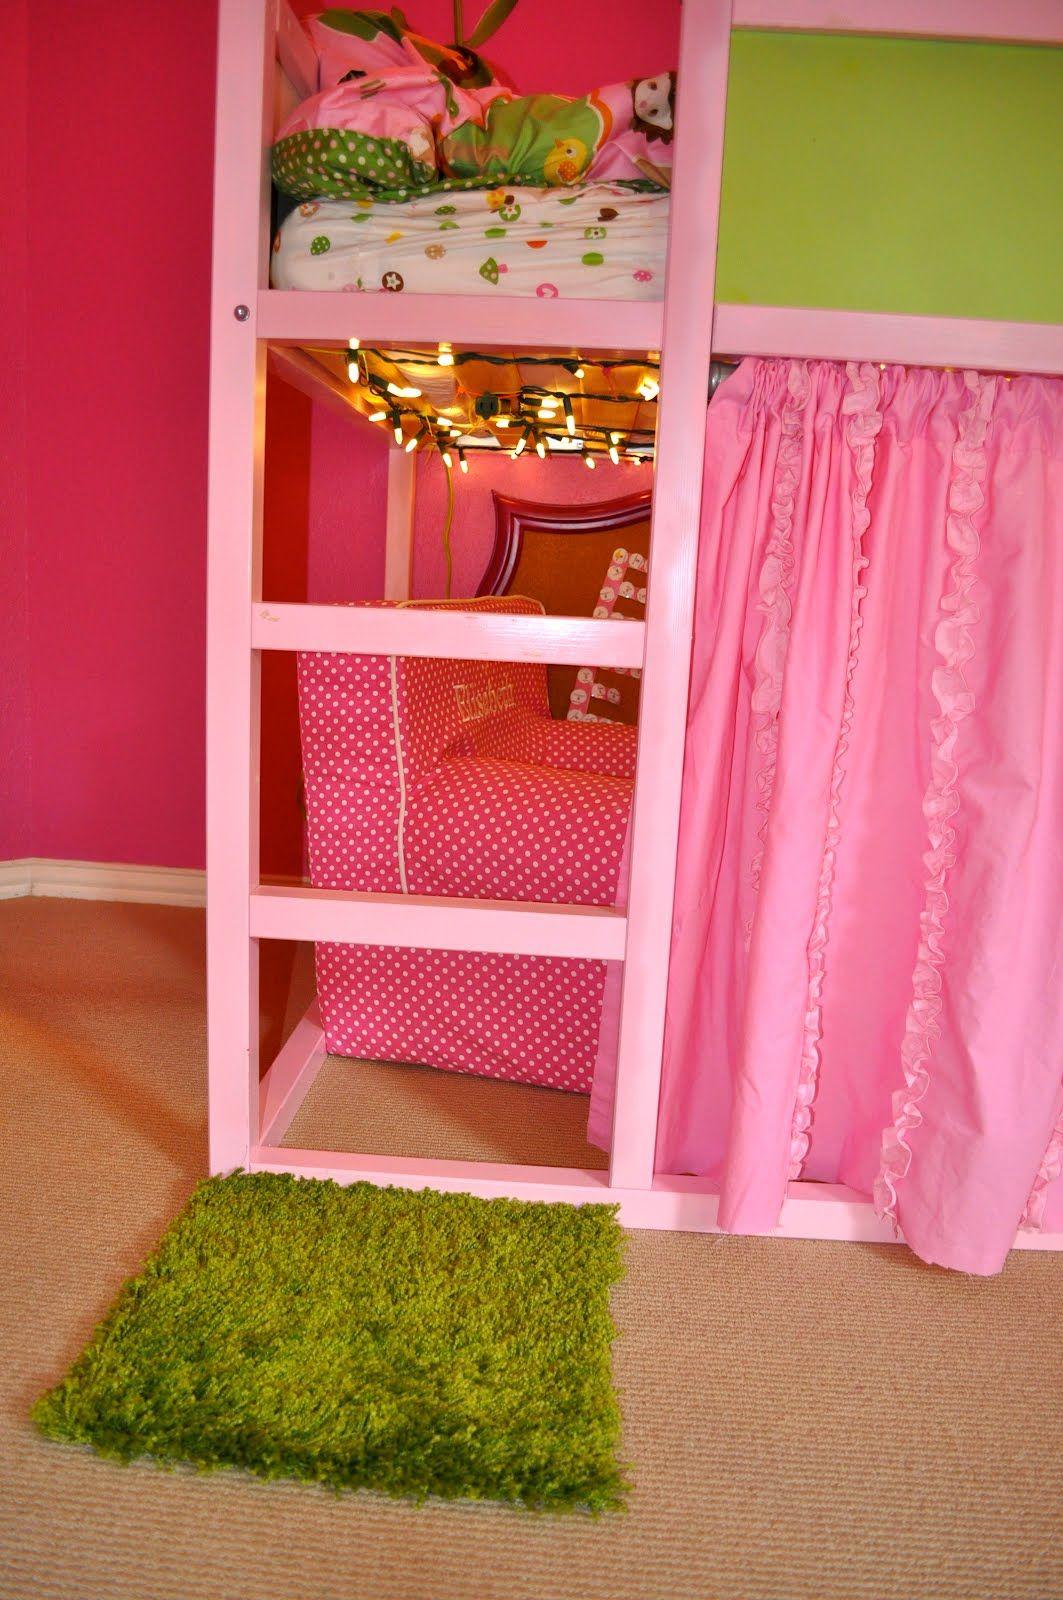 Loft bed curtain ideas  Kura Bed MakeOverGirls  The Best of Times  Kura bed  Pinterest